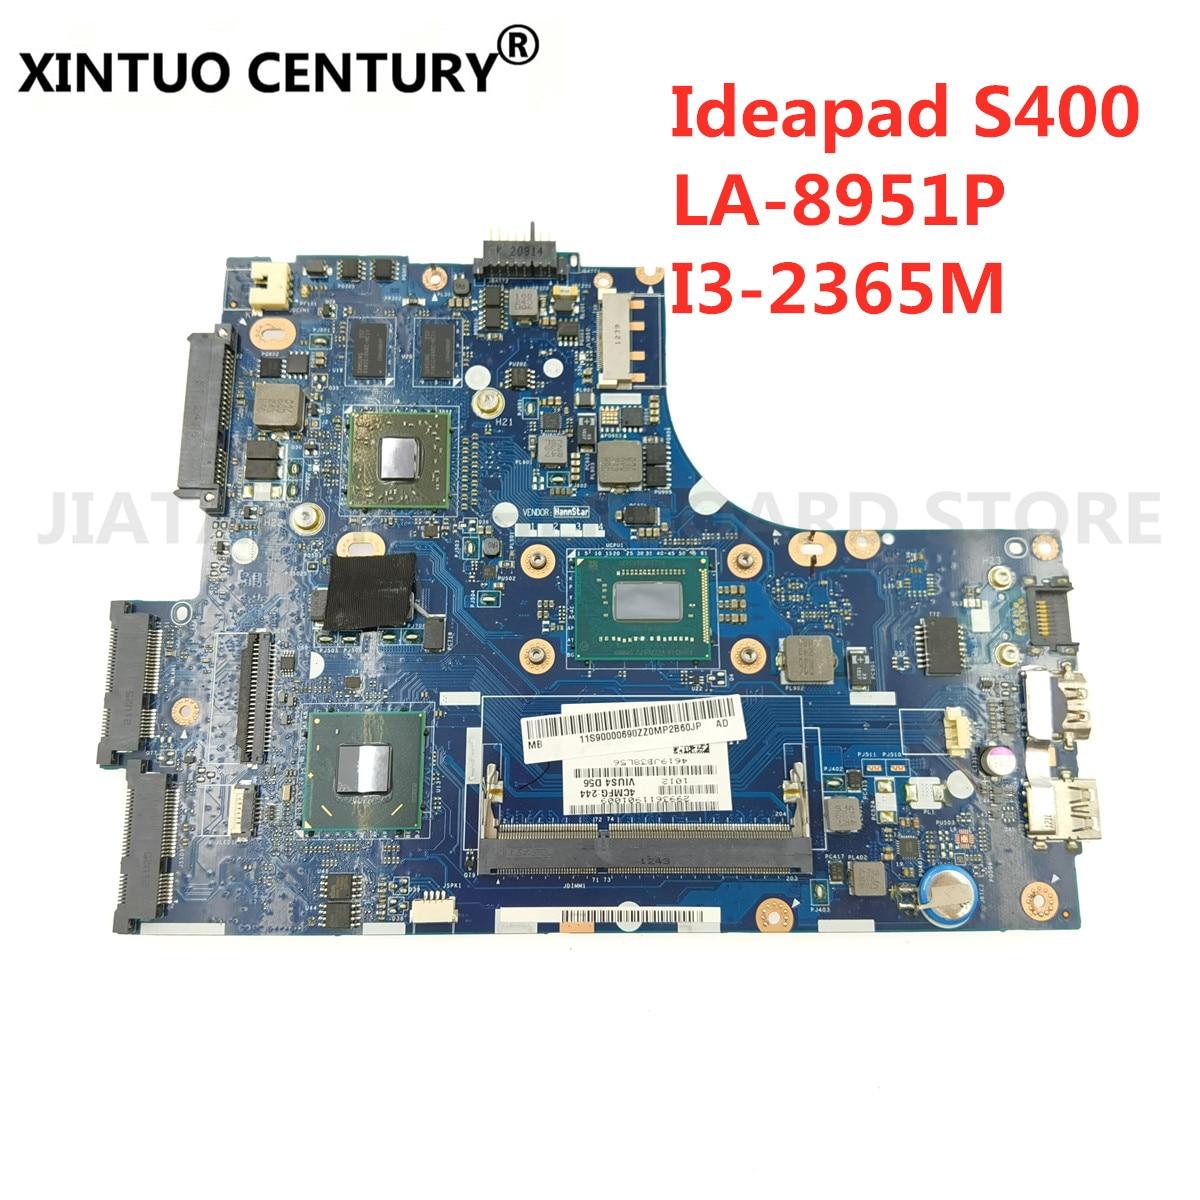 Für lenovo ideapad S300 S400 Laptop Mainboard VIUS3 VIUS4 LA-8951P motherboard mit grafiken I3-2365M